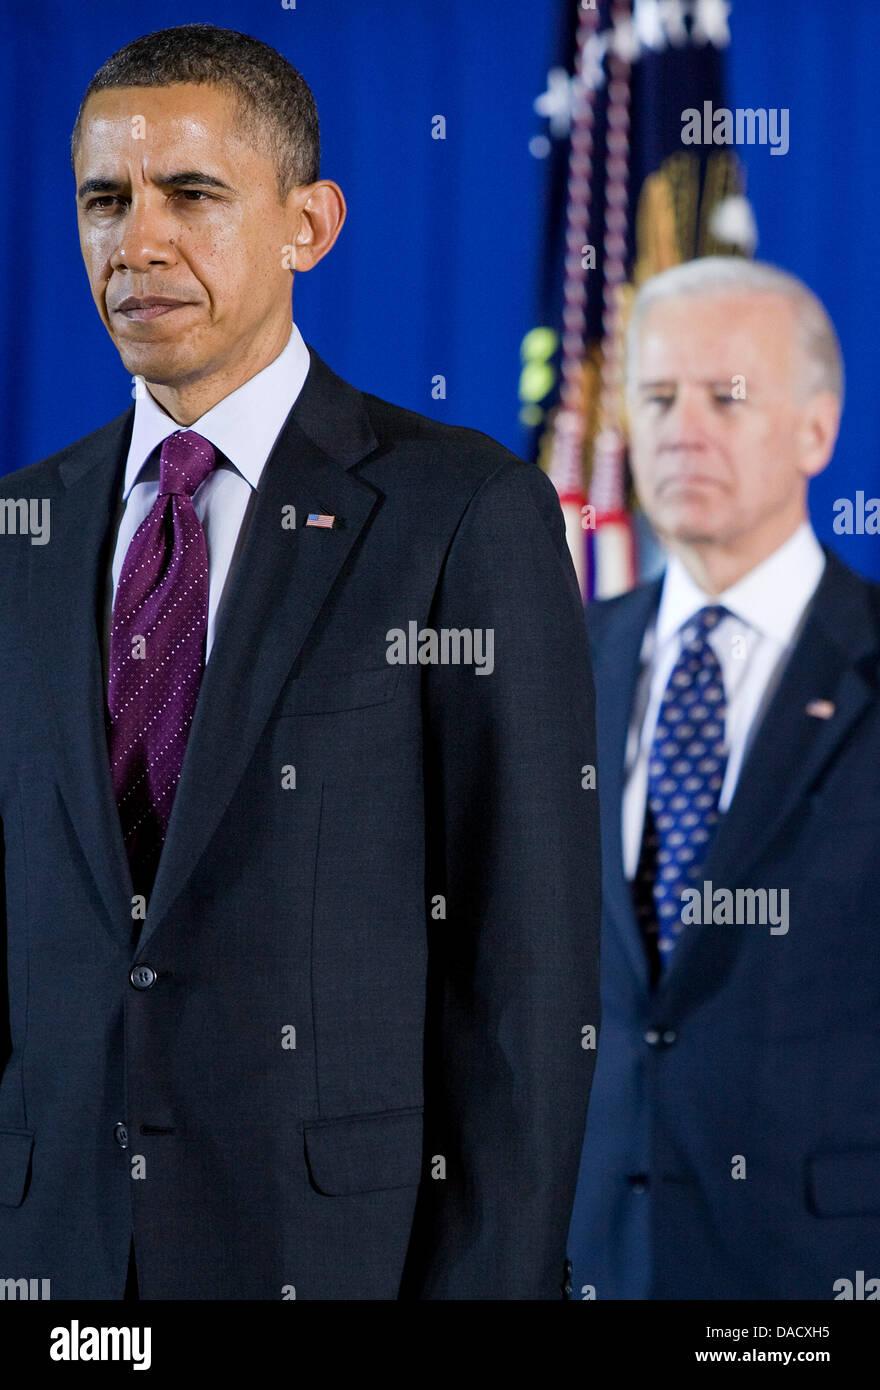 united states president barack obama and vice president joe biden